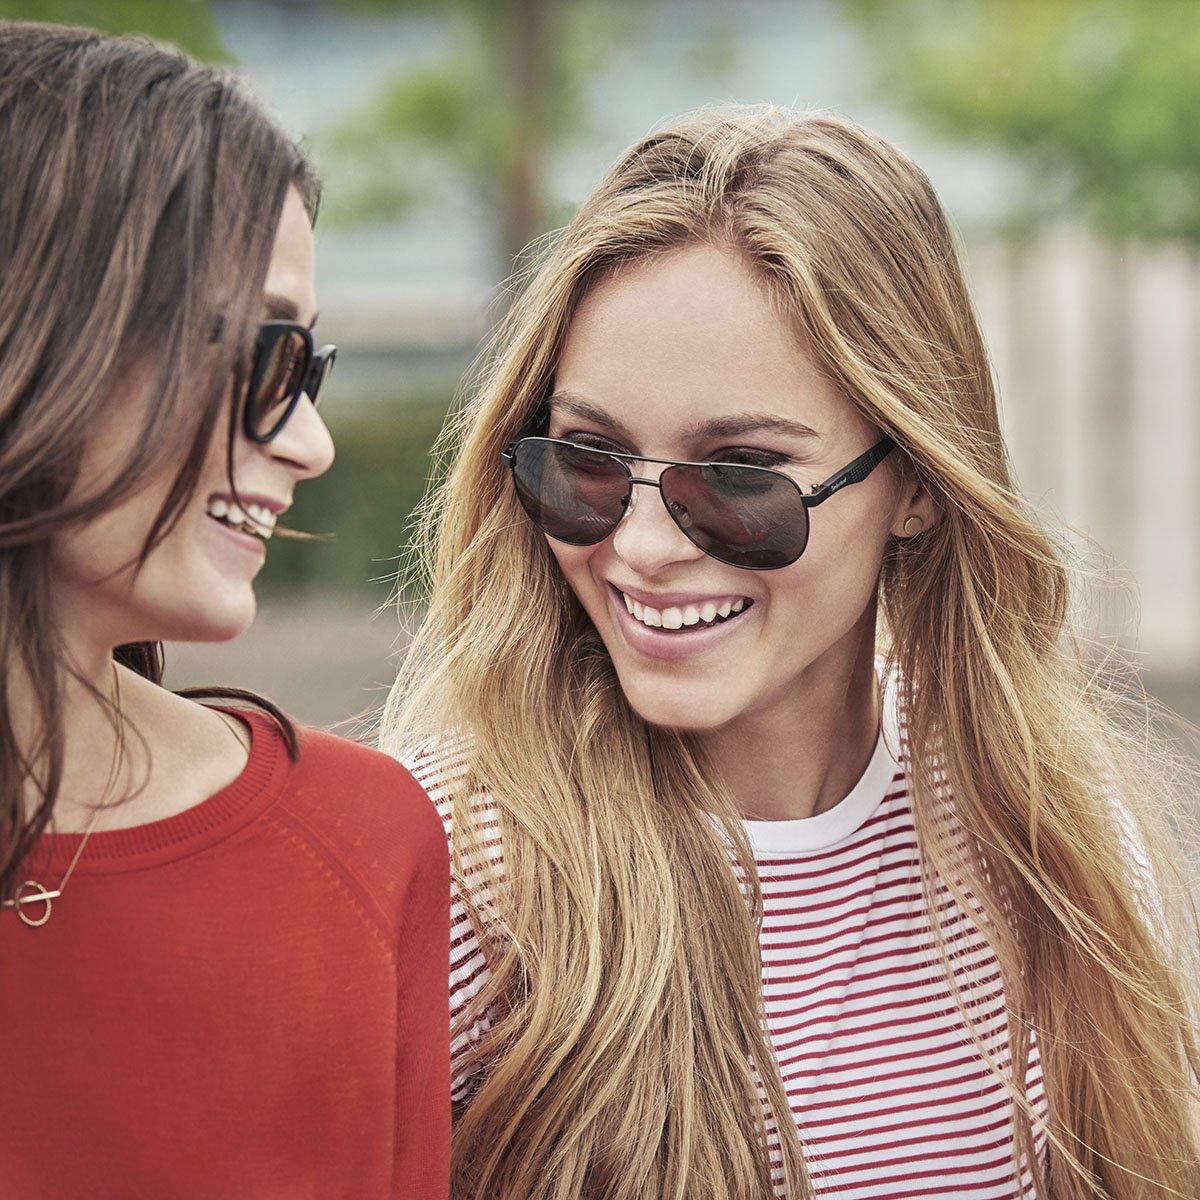 Summertime sunnies! ☀️😎  Shop sunglasses: https://t.co/Ec5vBi5nmX https://t.co/IqMJISAFEb